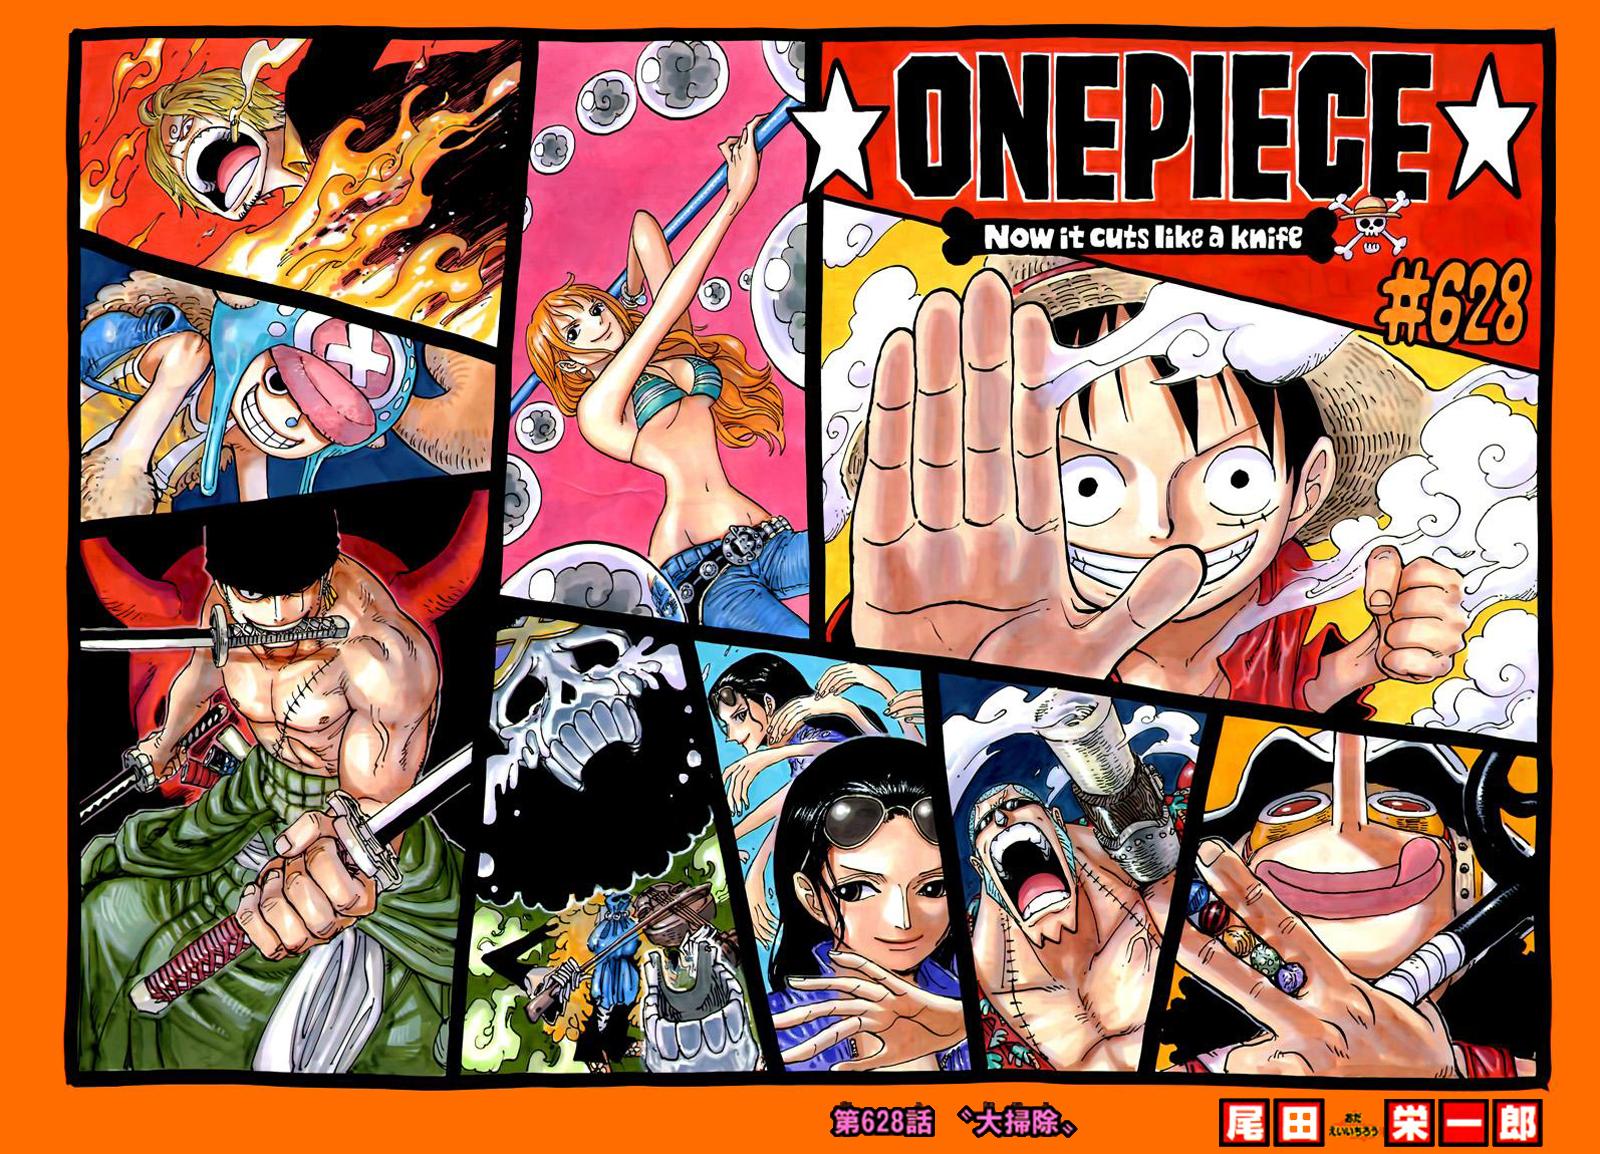 One Piece おしゃれまとめの人気アイデア Pinterest Eduardo Silva Onepiece イラスト ワンピース 扉絵 漫画